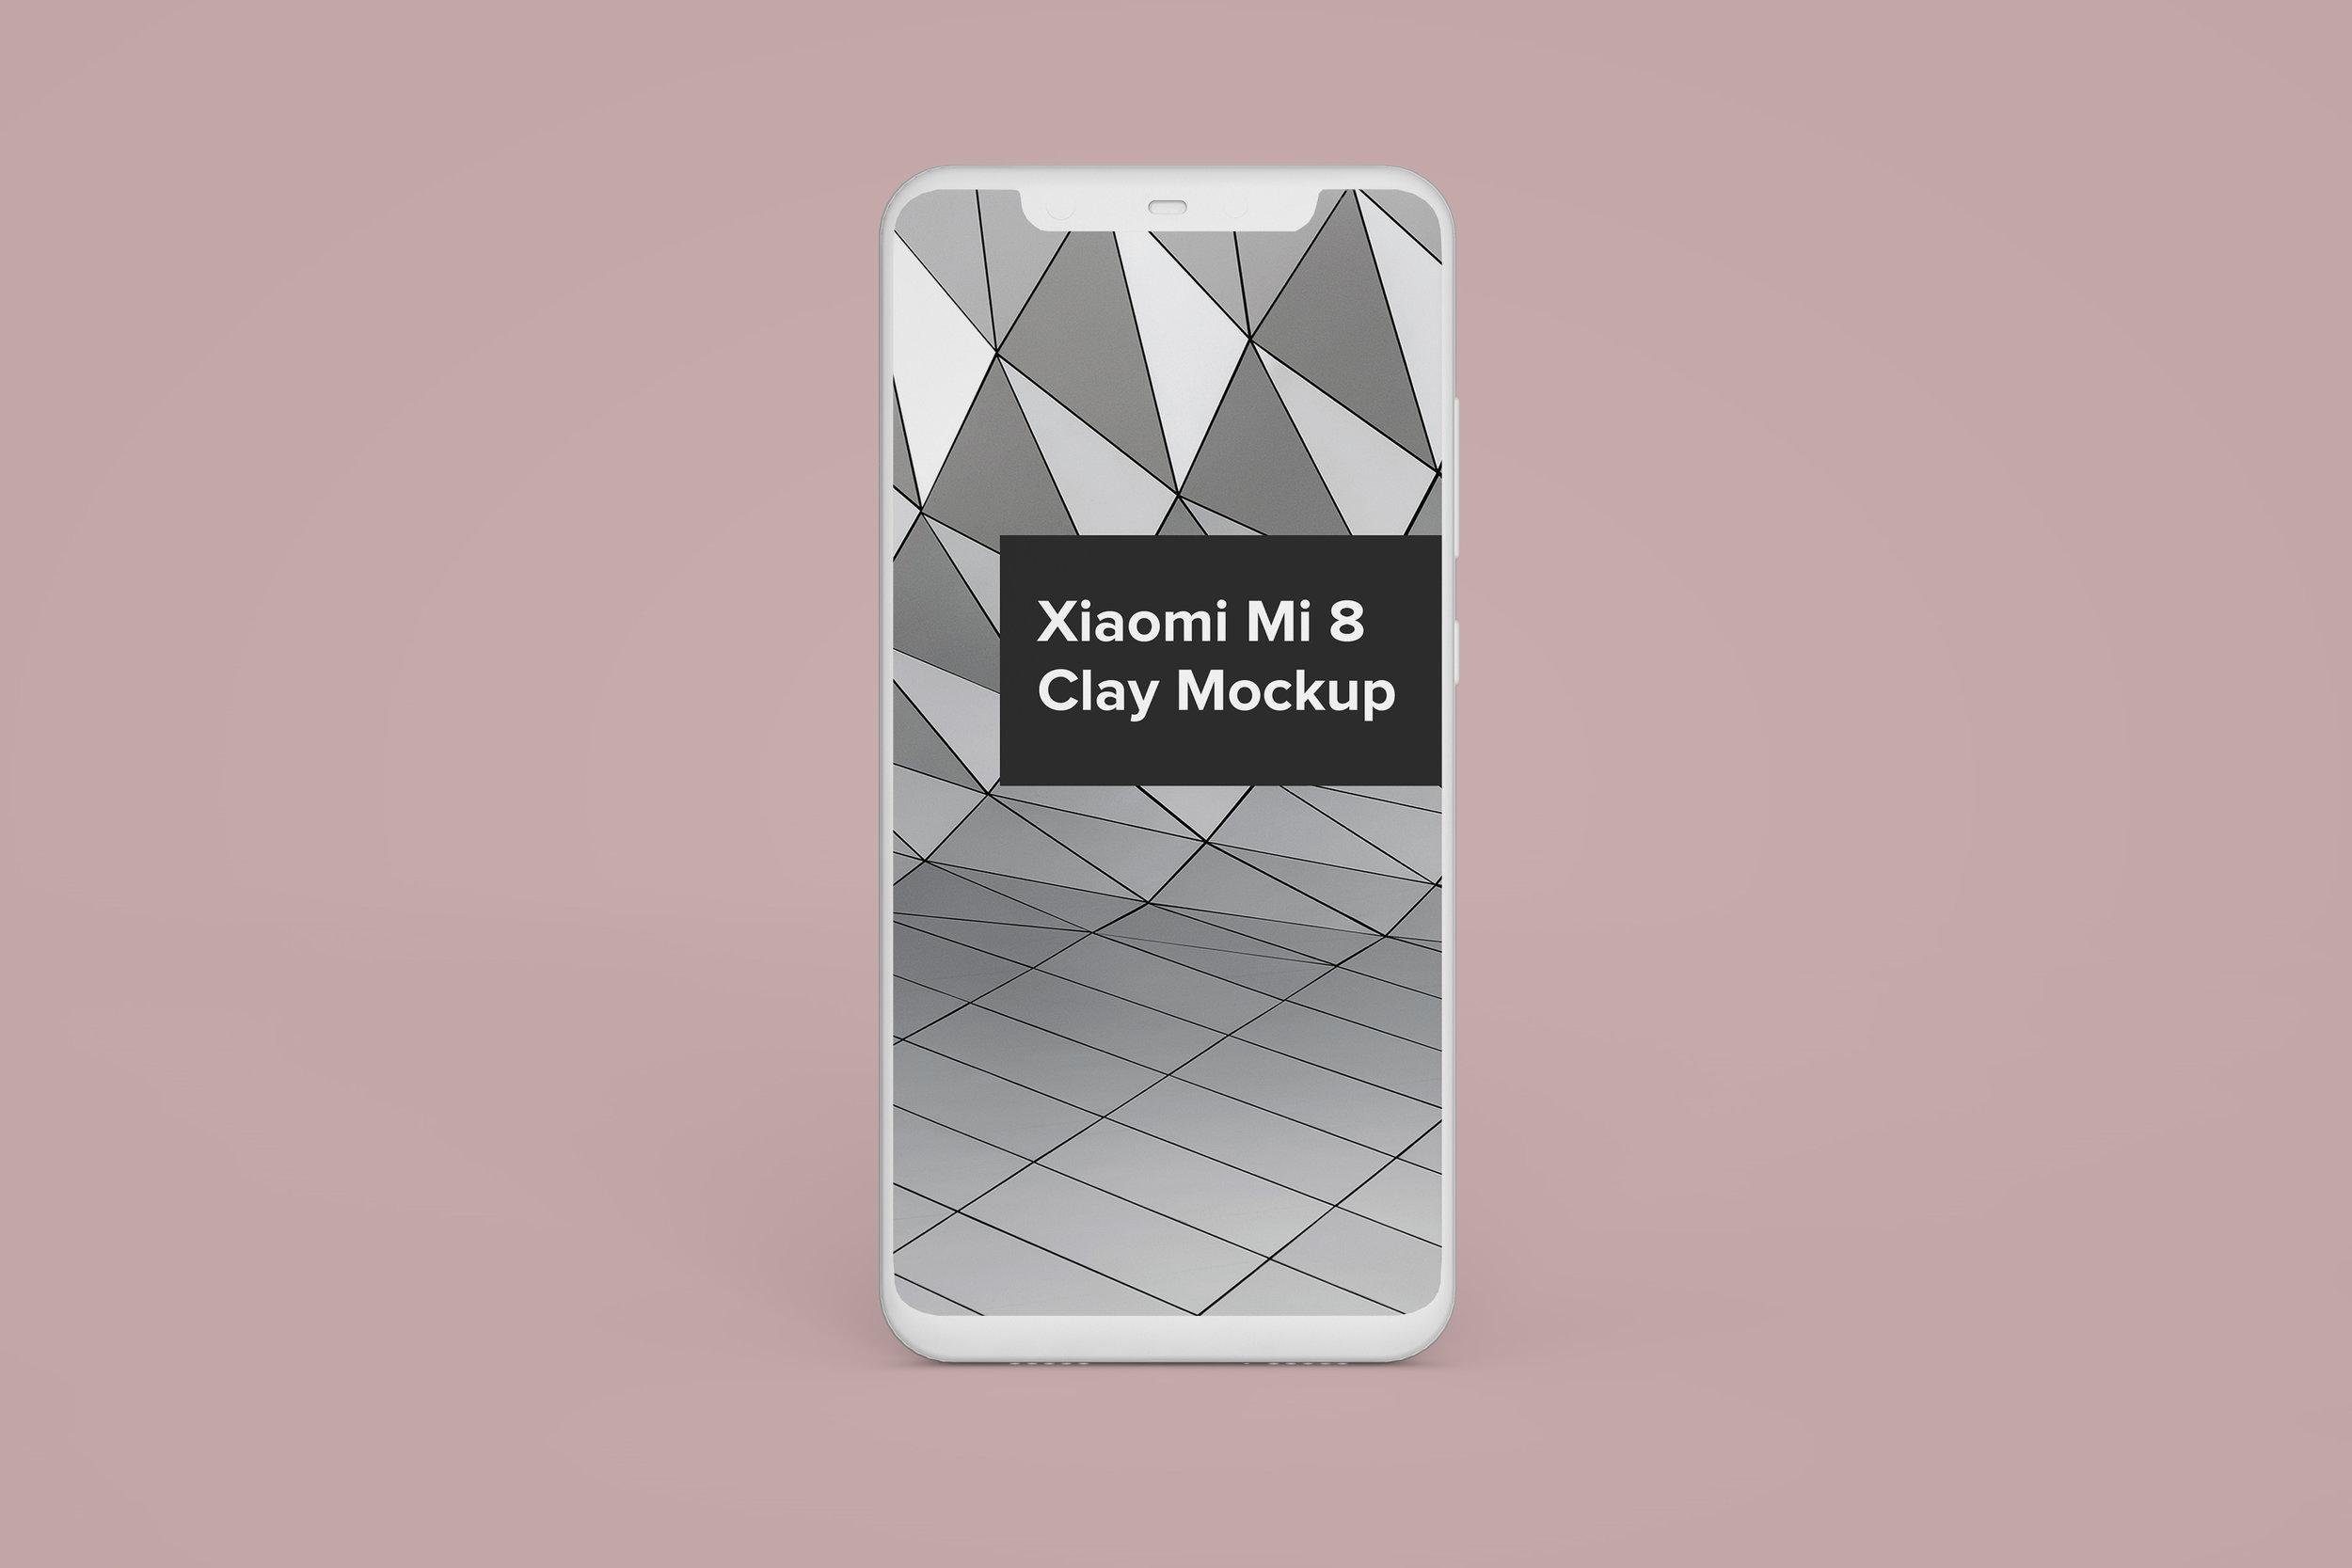 Xiaomi Mi8 Clay Android Mockup - $3.00 USD - Minimal editable Xiaomi Mi8 mockup with smart objects.